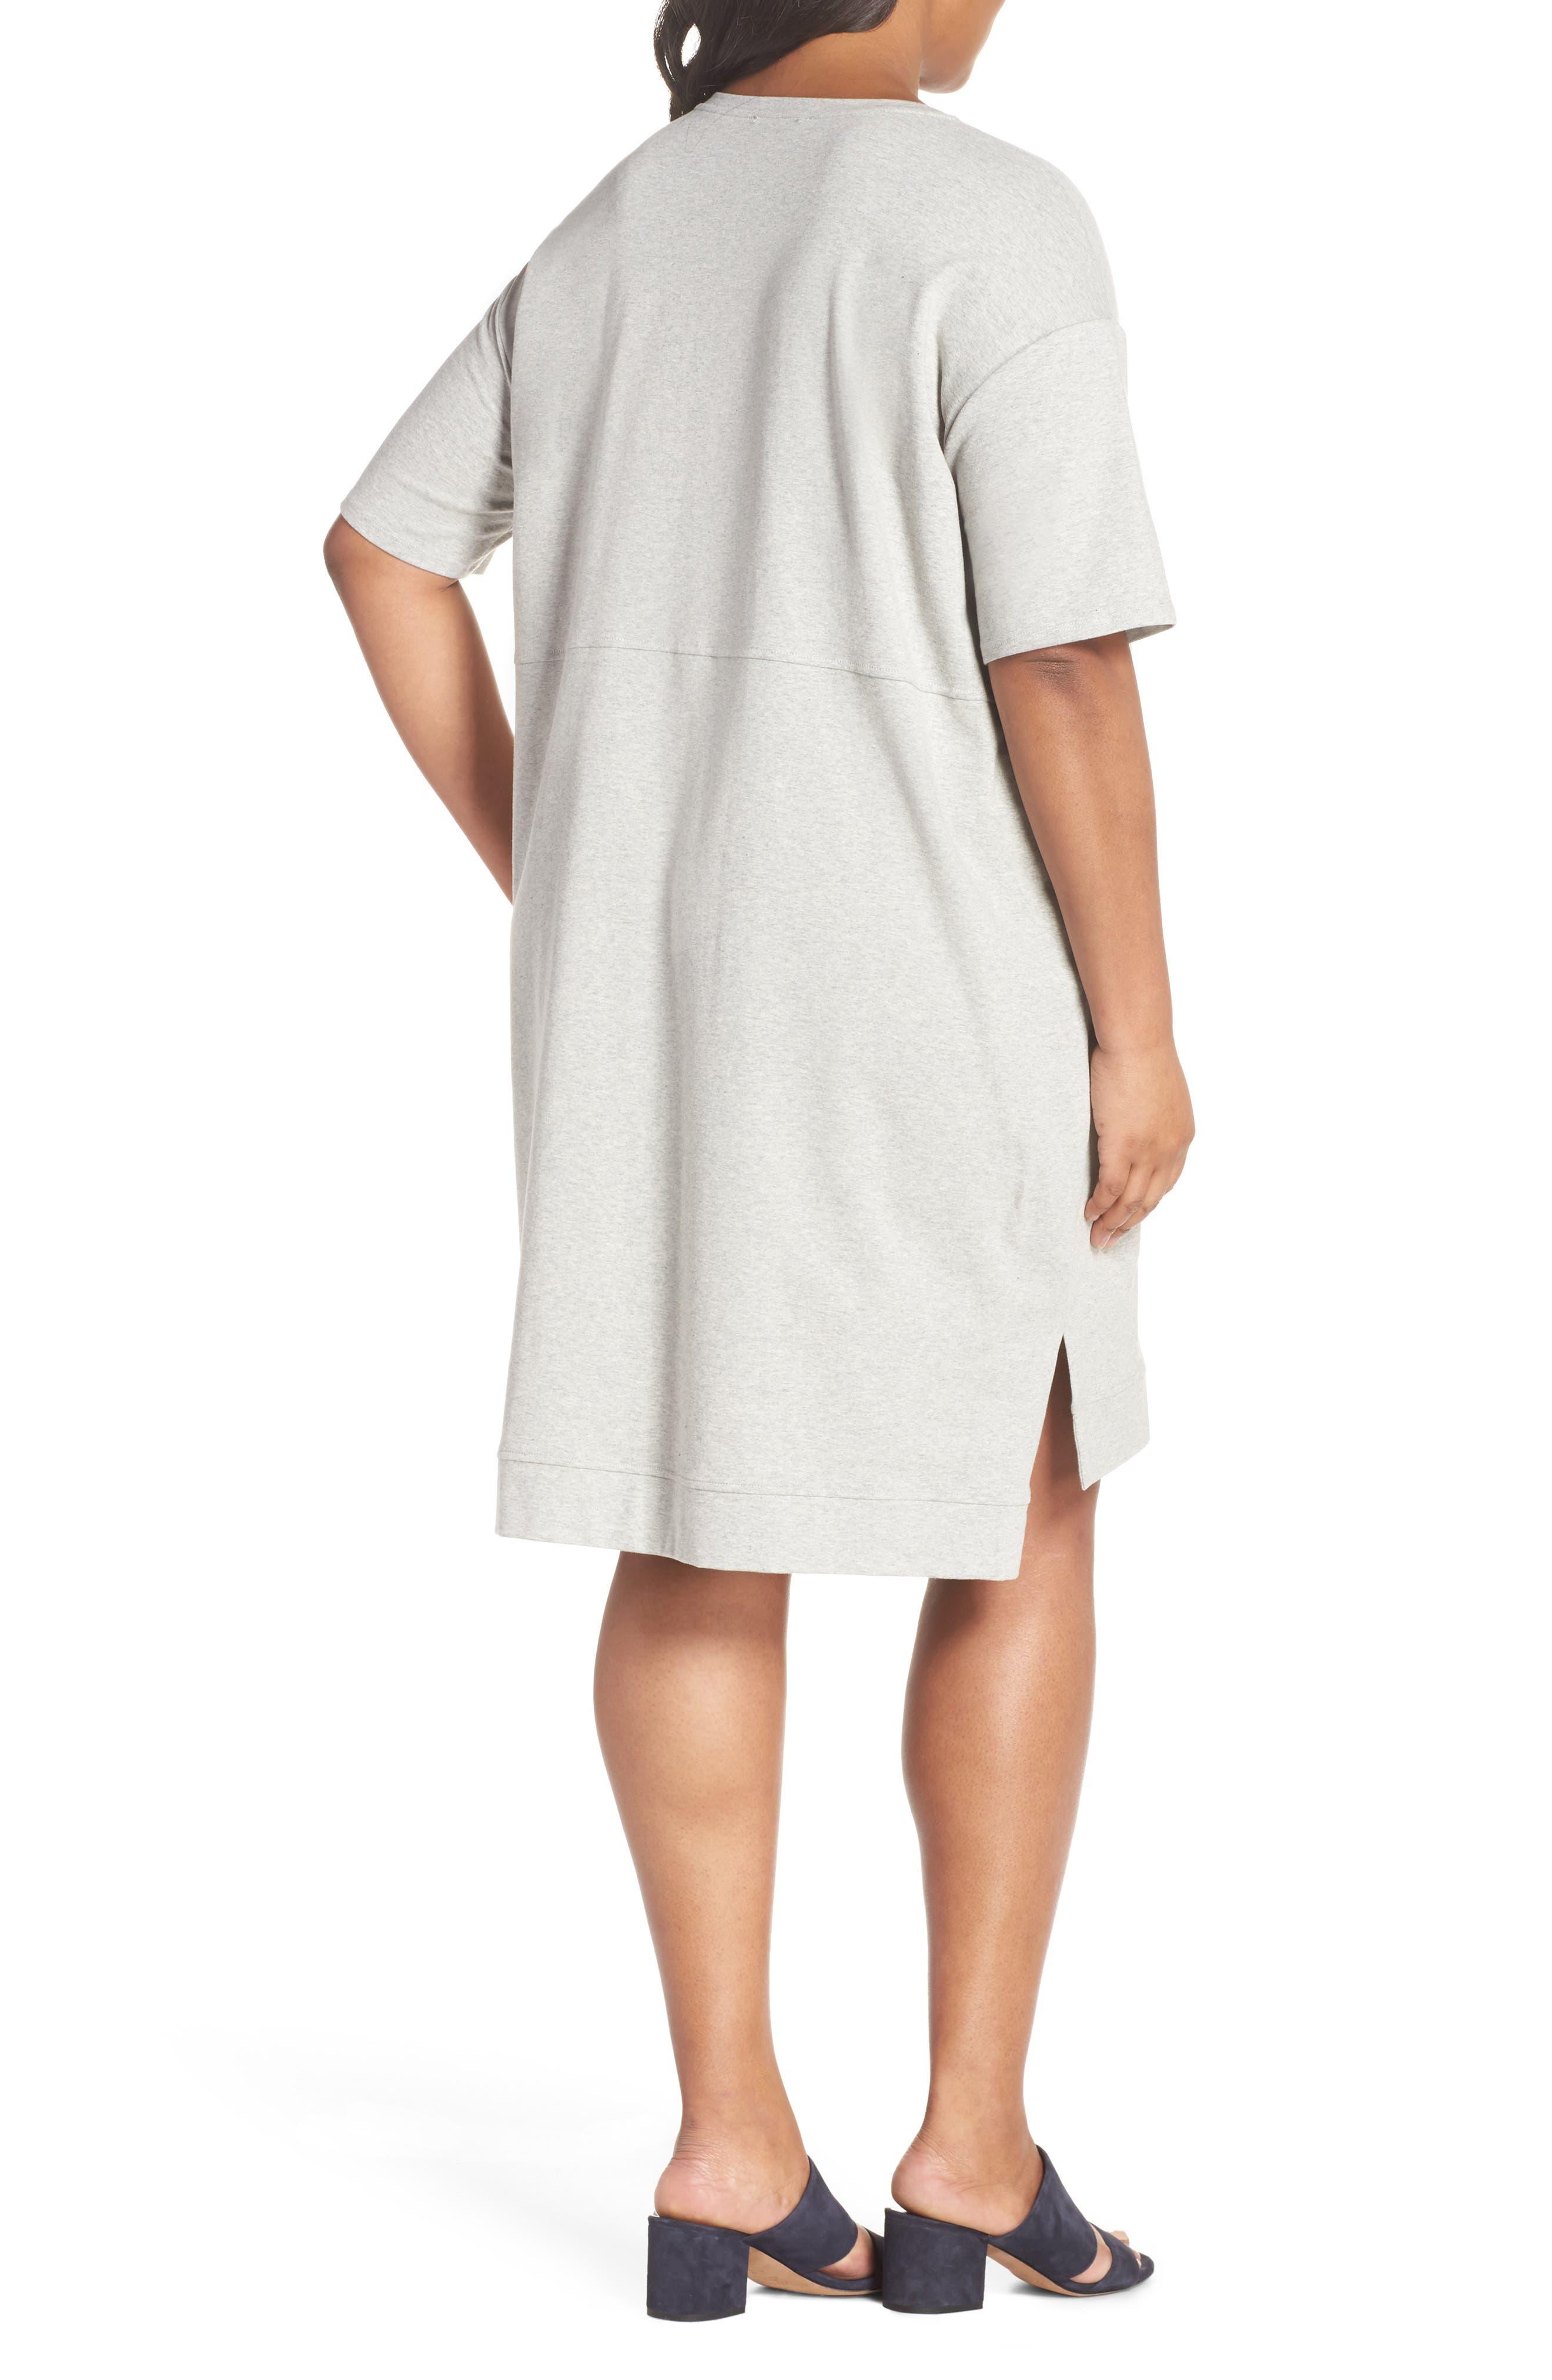 Organic Stretch Cotton Shift Dress,                             Alternate thumbnail 2, color,                             020